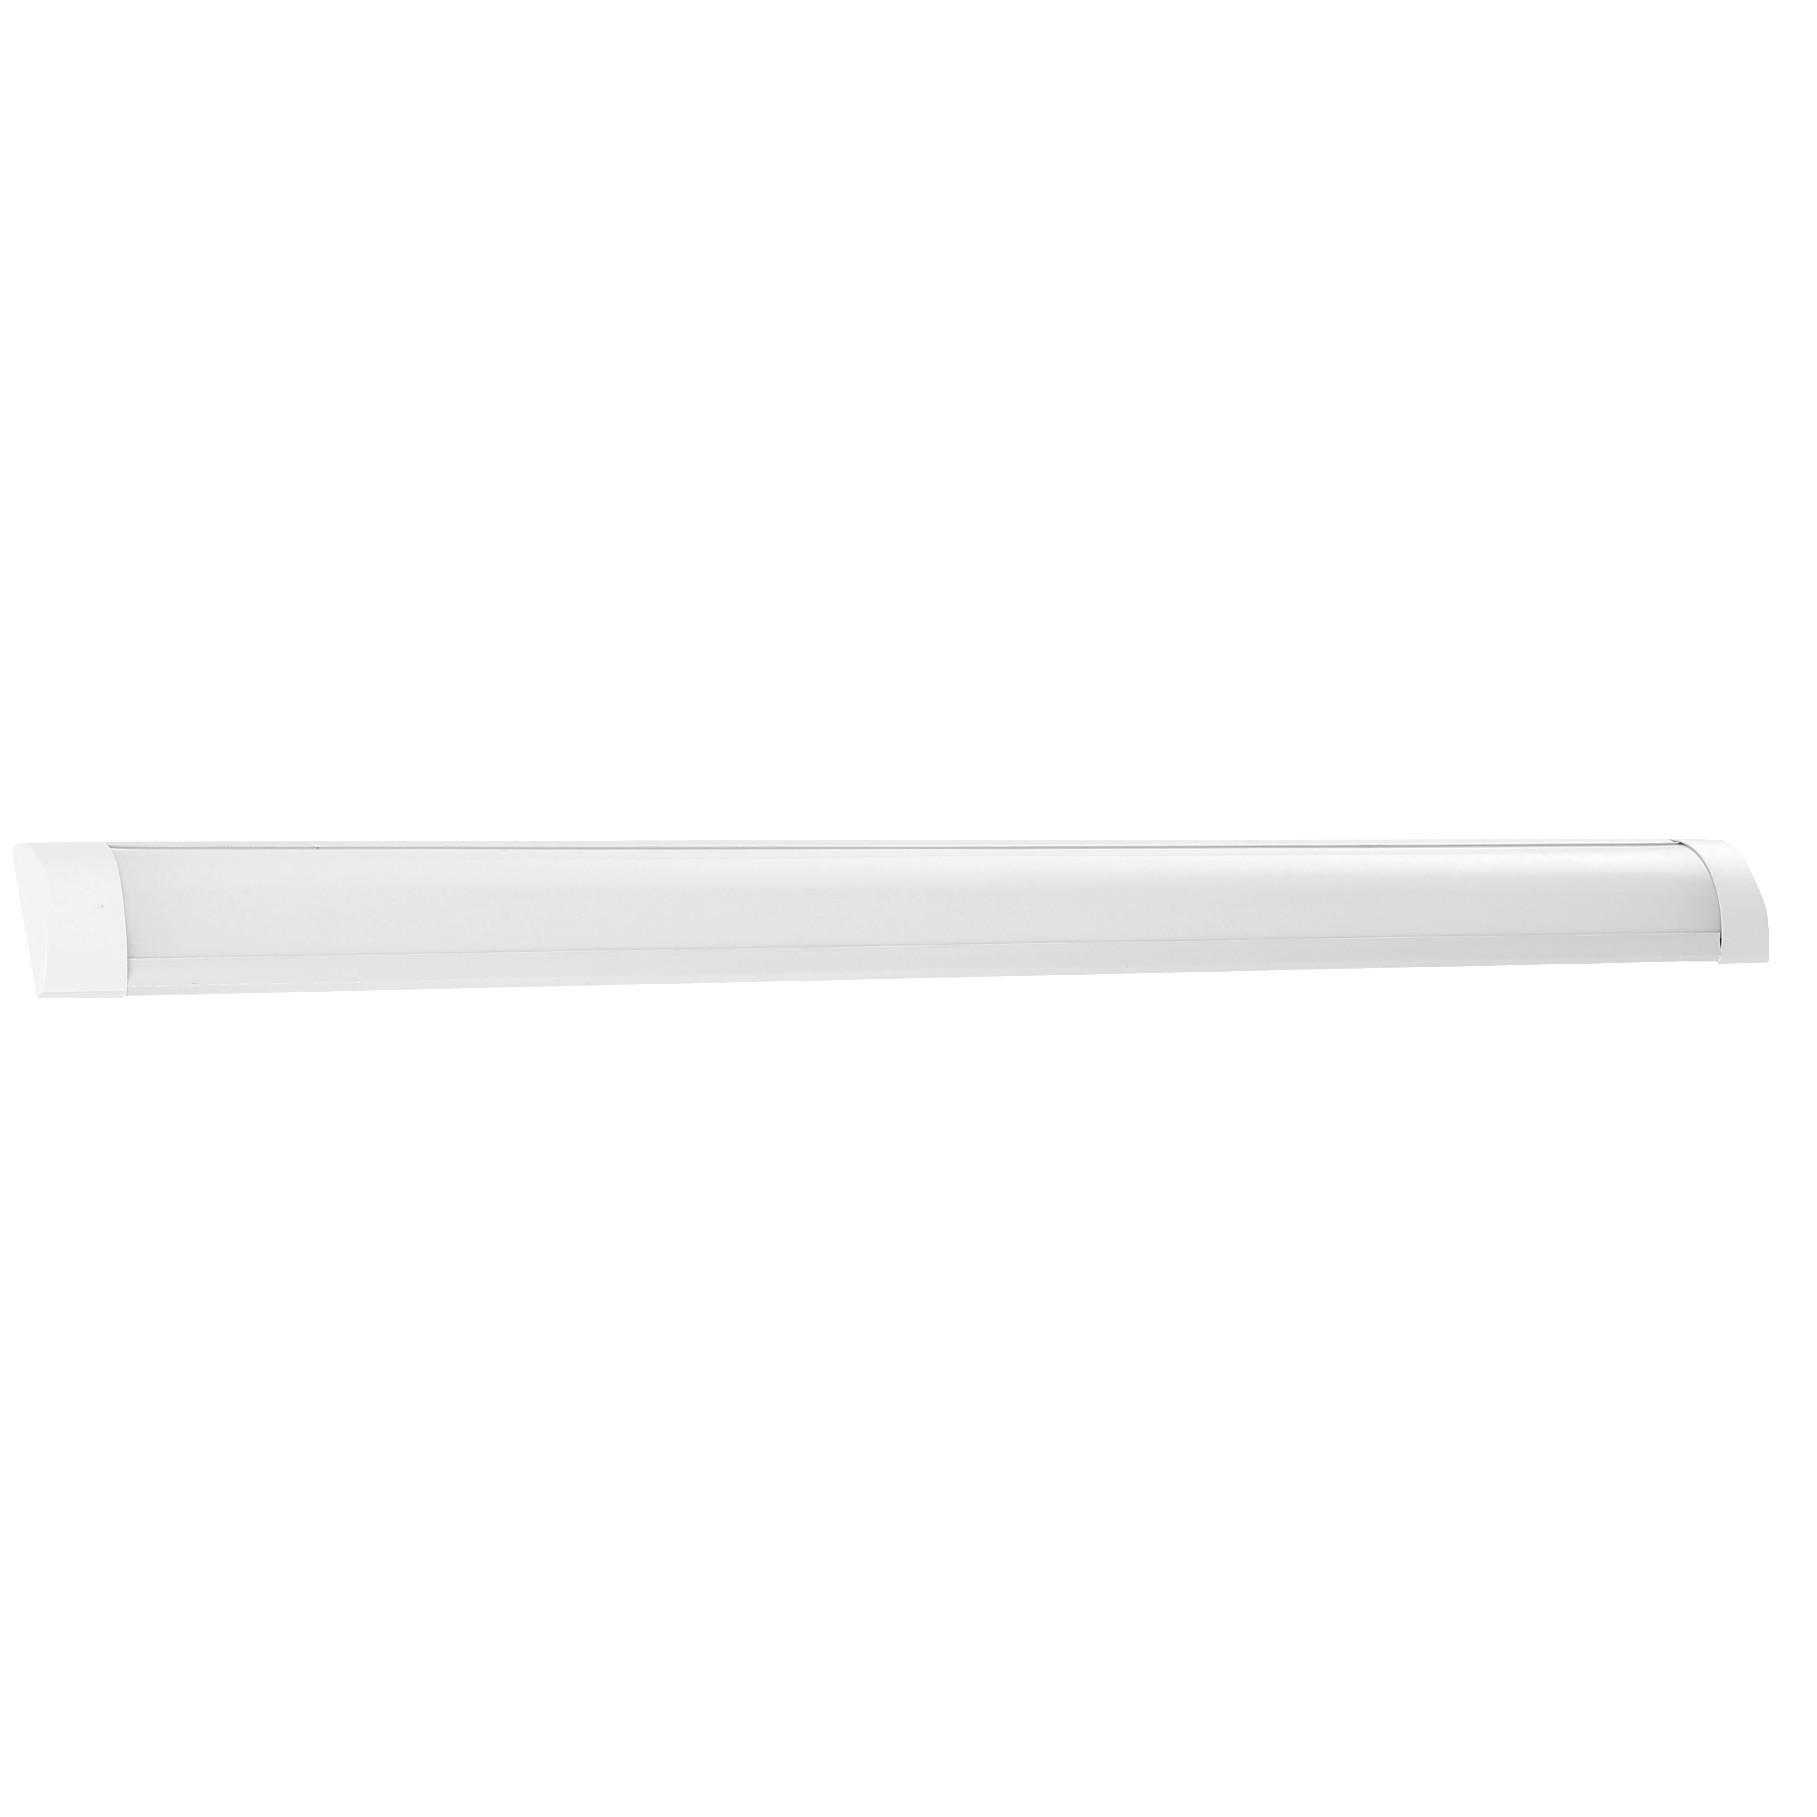 Luminaria LED Elegance Slim de Sobrepor 18W Luz Branca - Avant